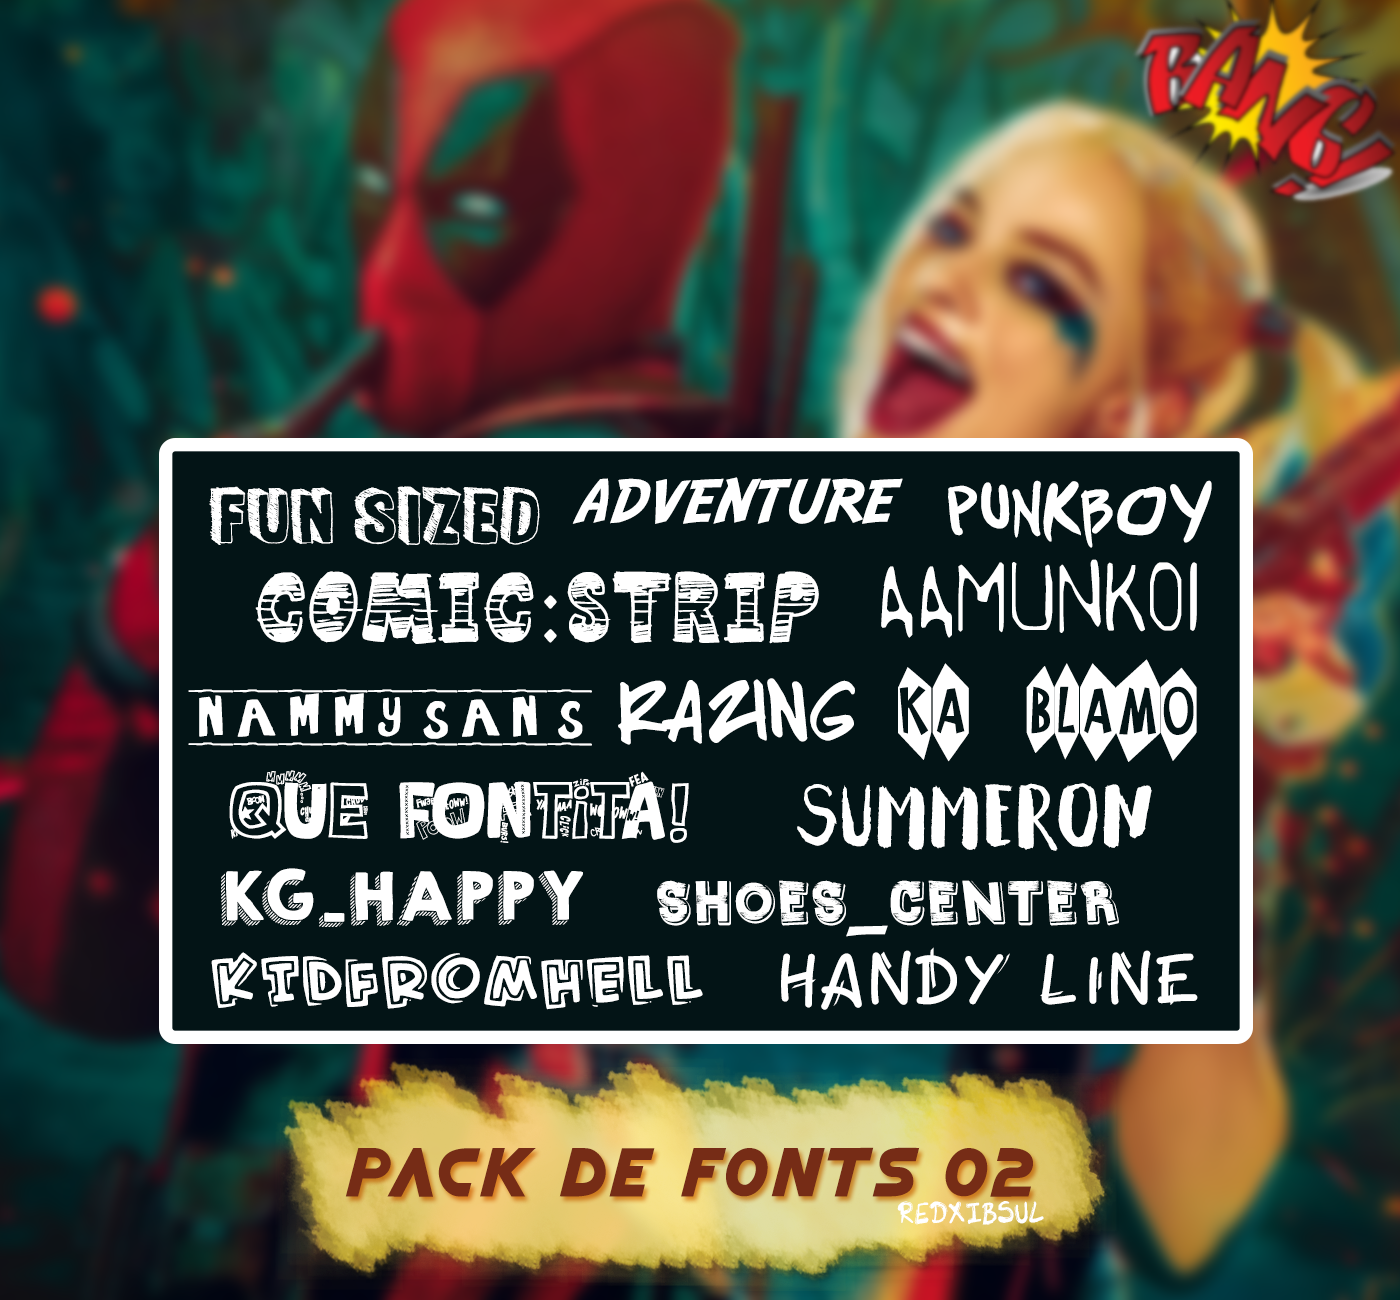 Pack font 02 Estilo comic by Redxibsul